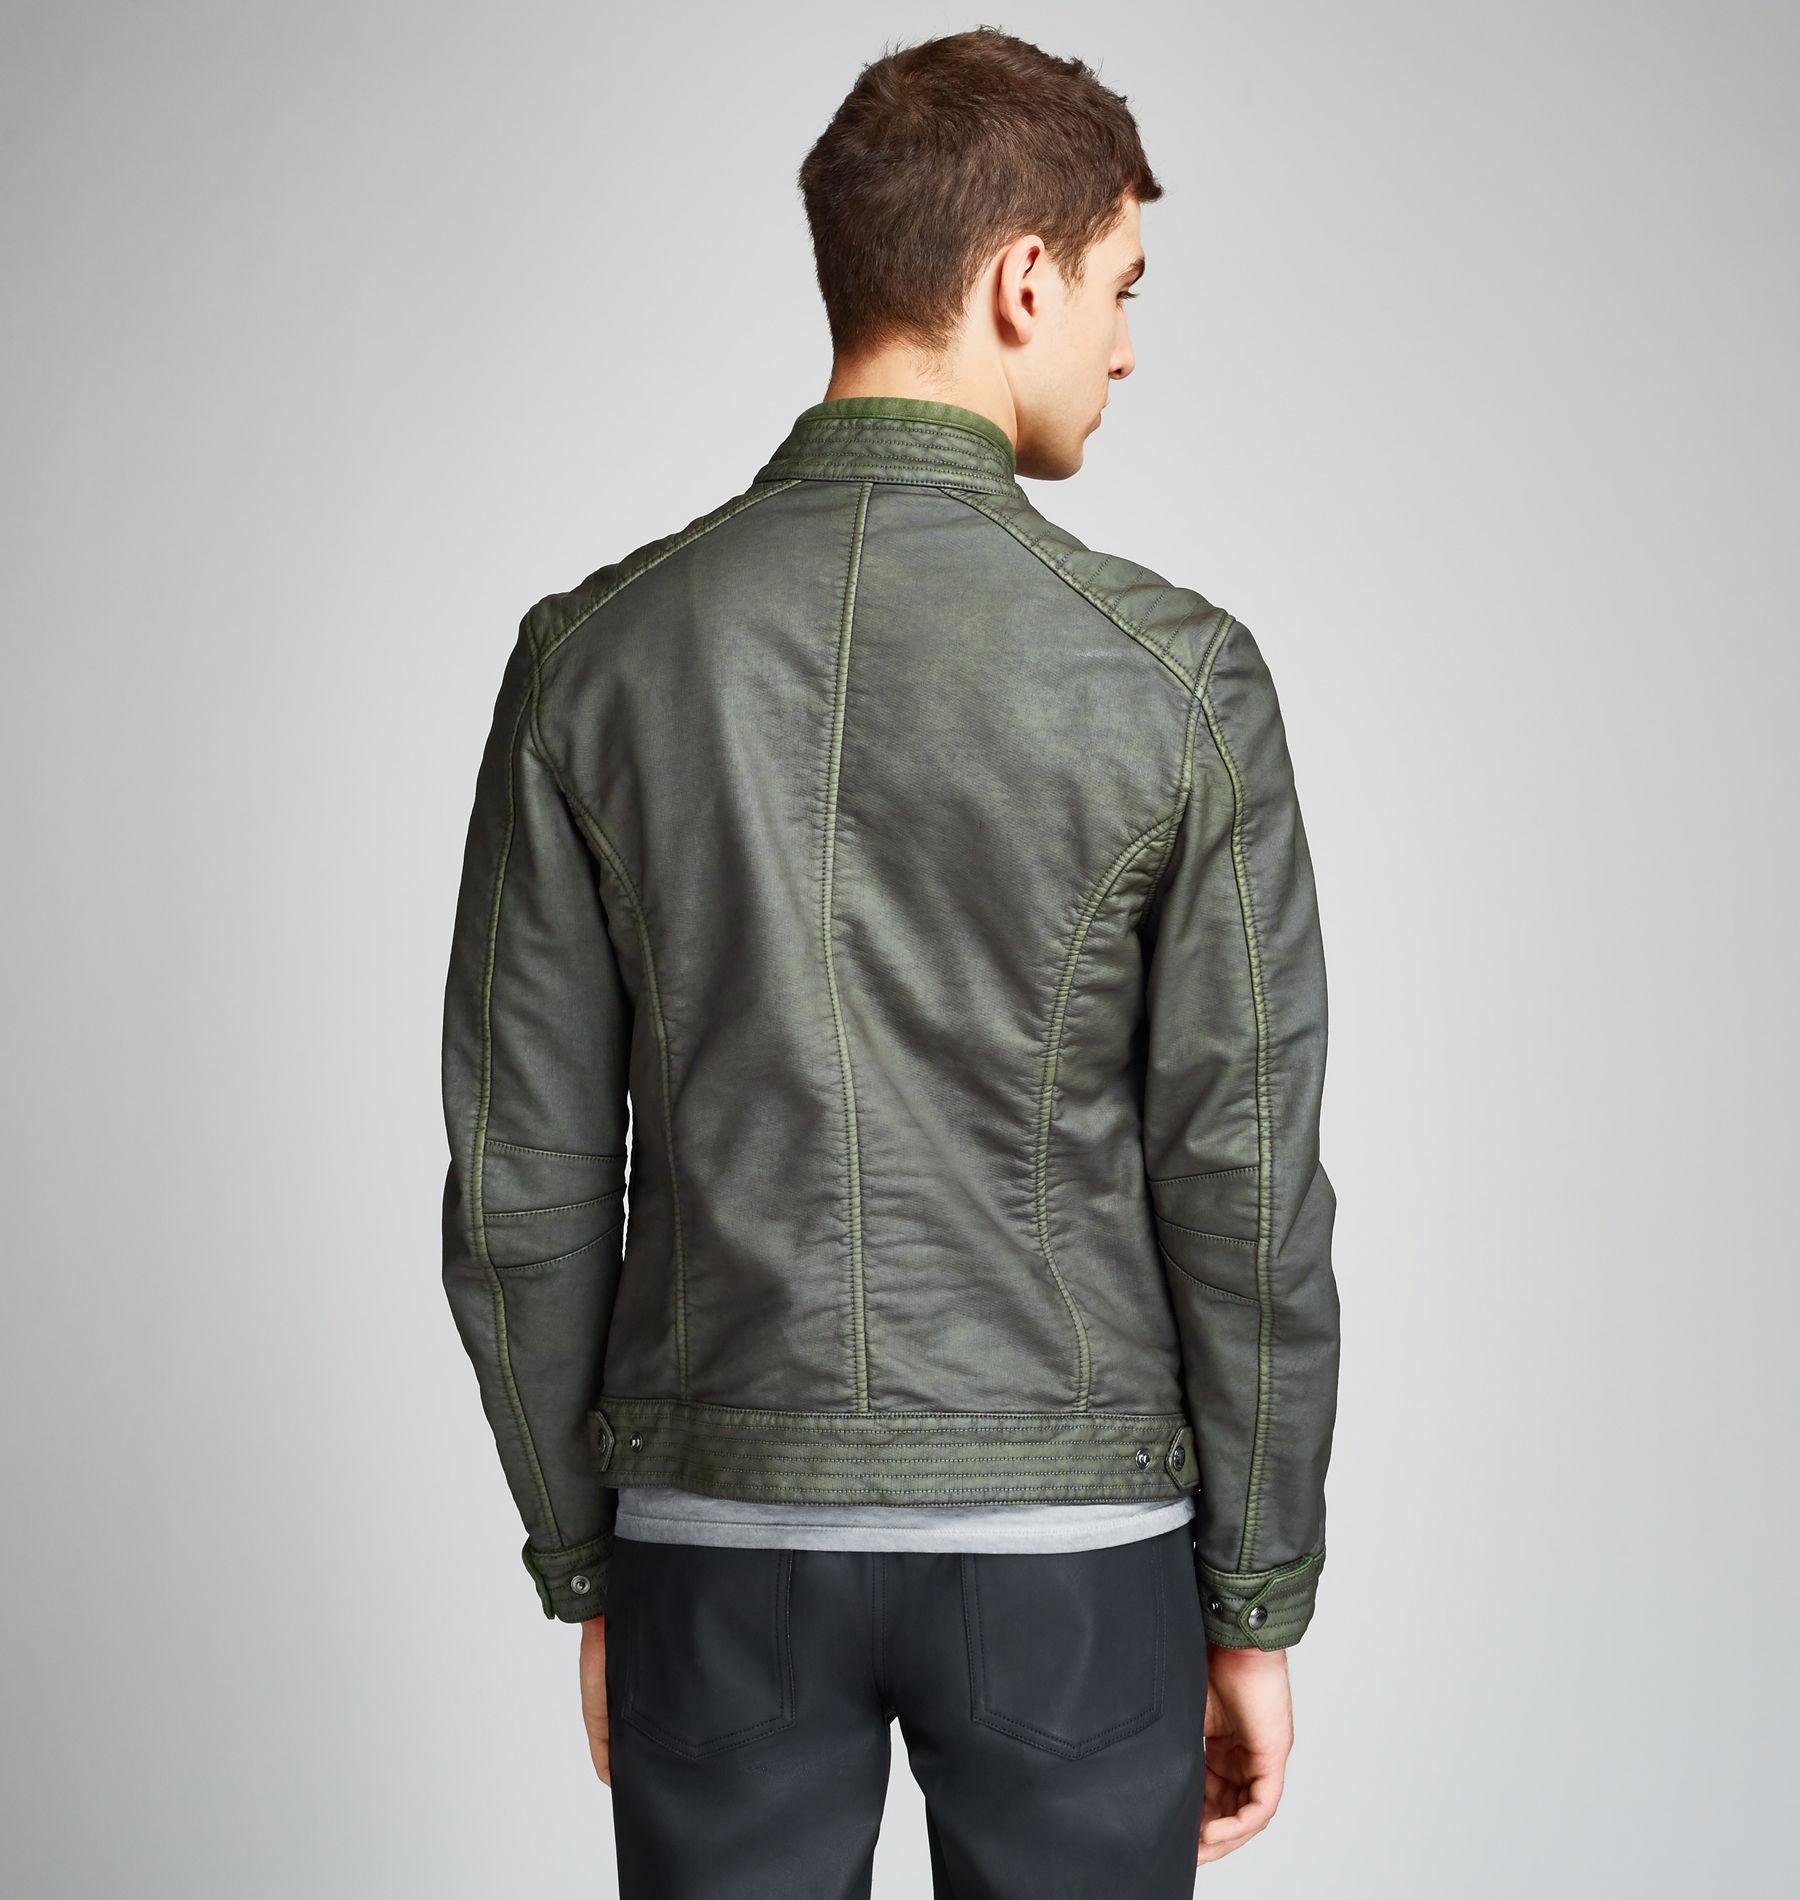 H racer cardigan jacket